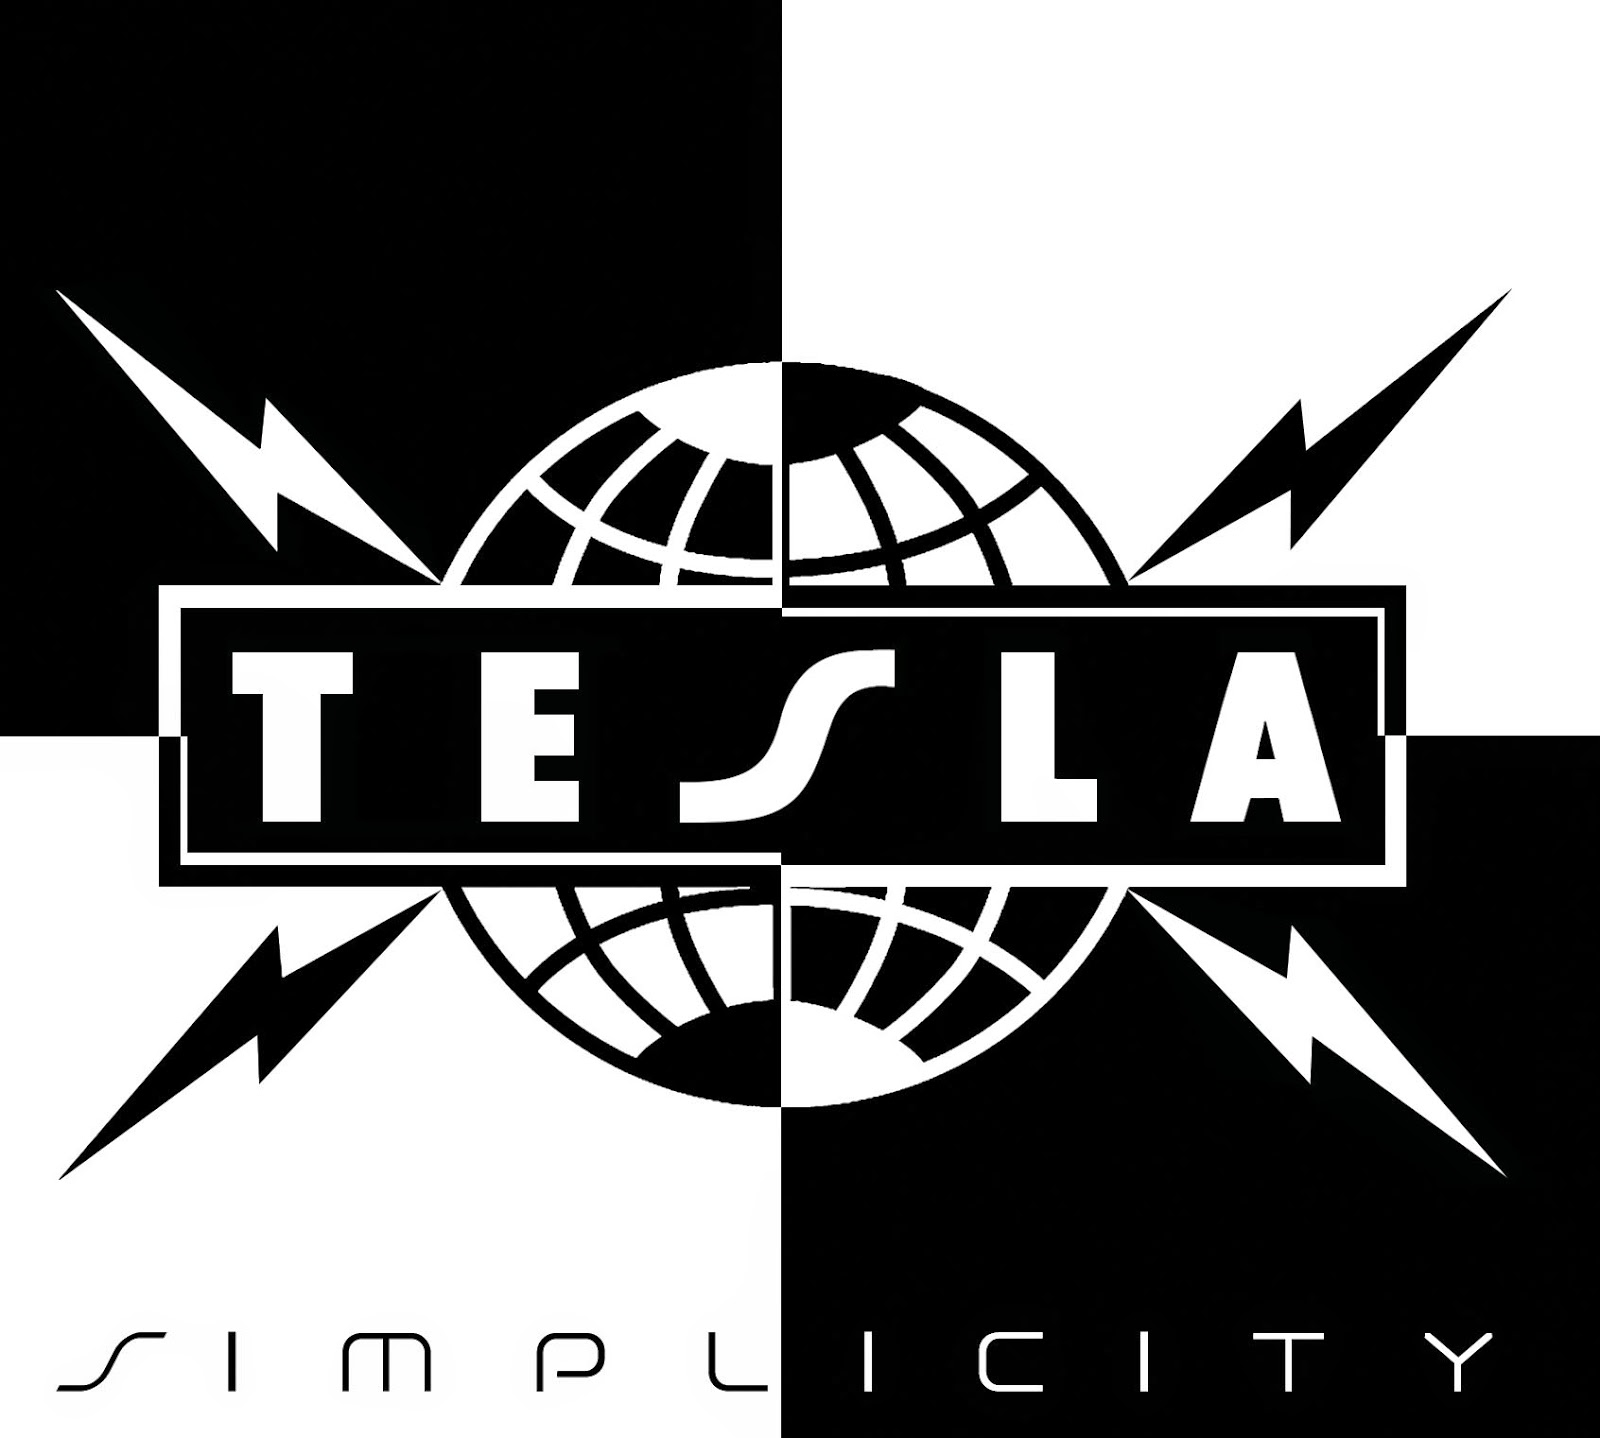 THE METAL ADVISOR: Tesla - Simplicity (2014)